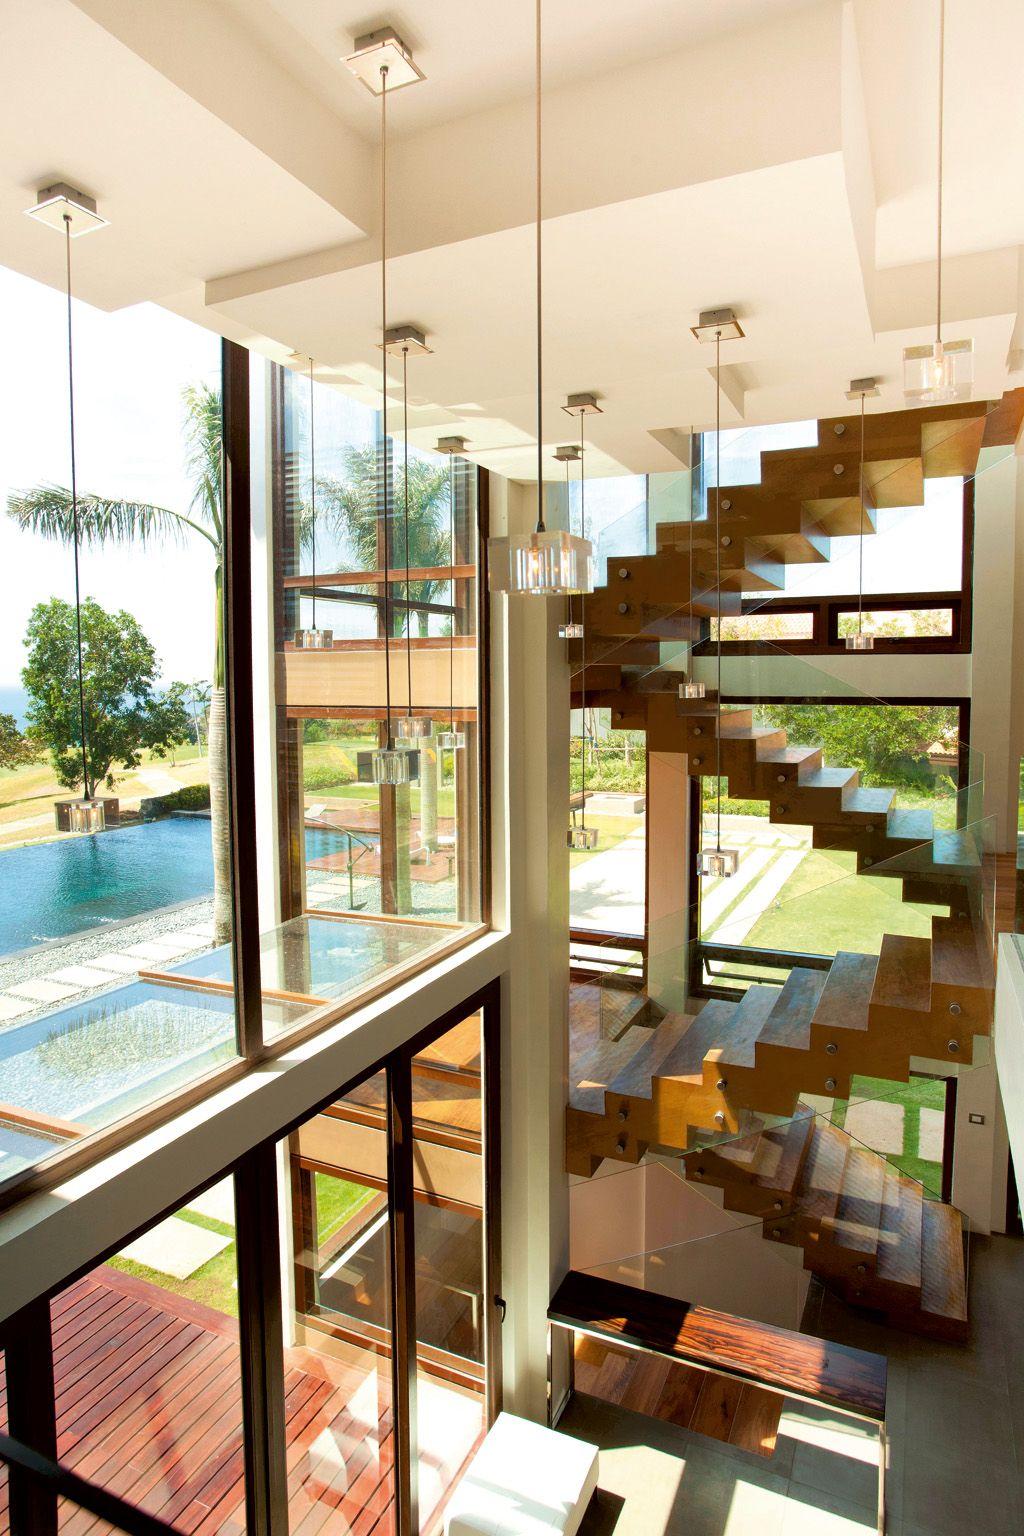 Stairway Architecture Design Architecture Interior Architecture Design